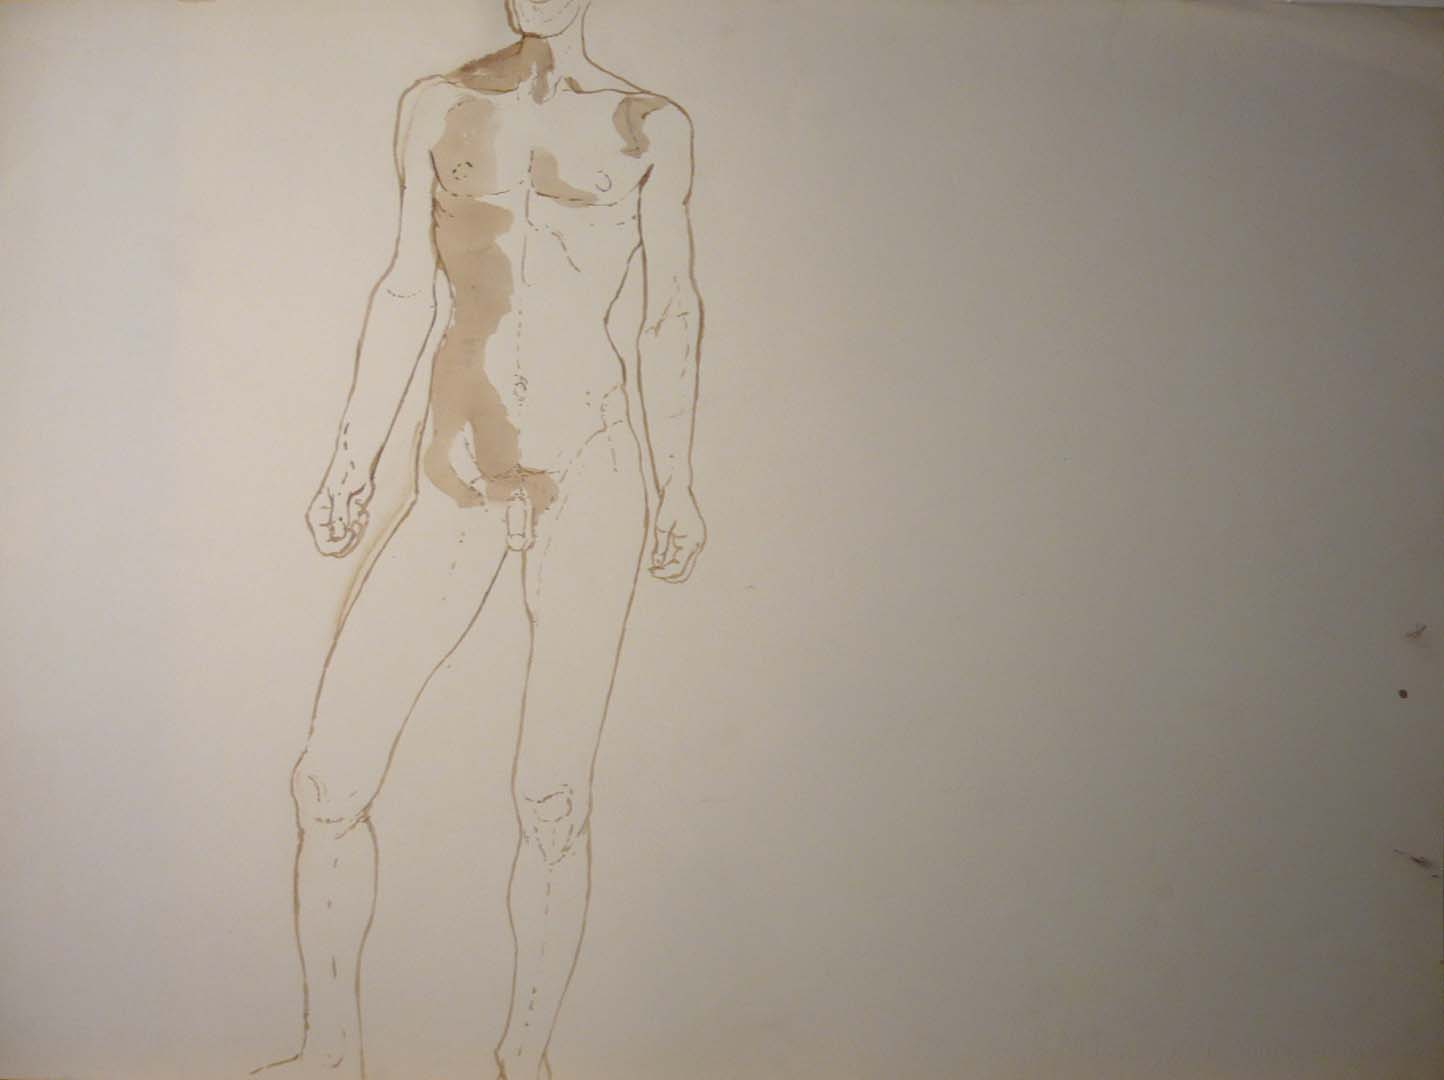 Male Model Standing in Studio Sepia 22 x 29.875